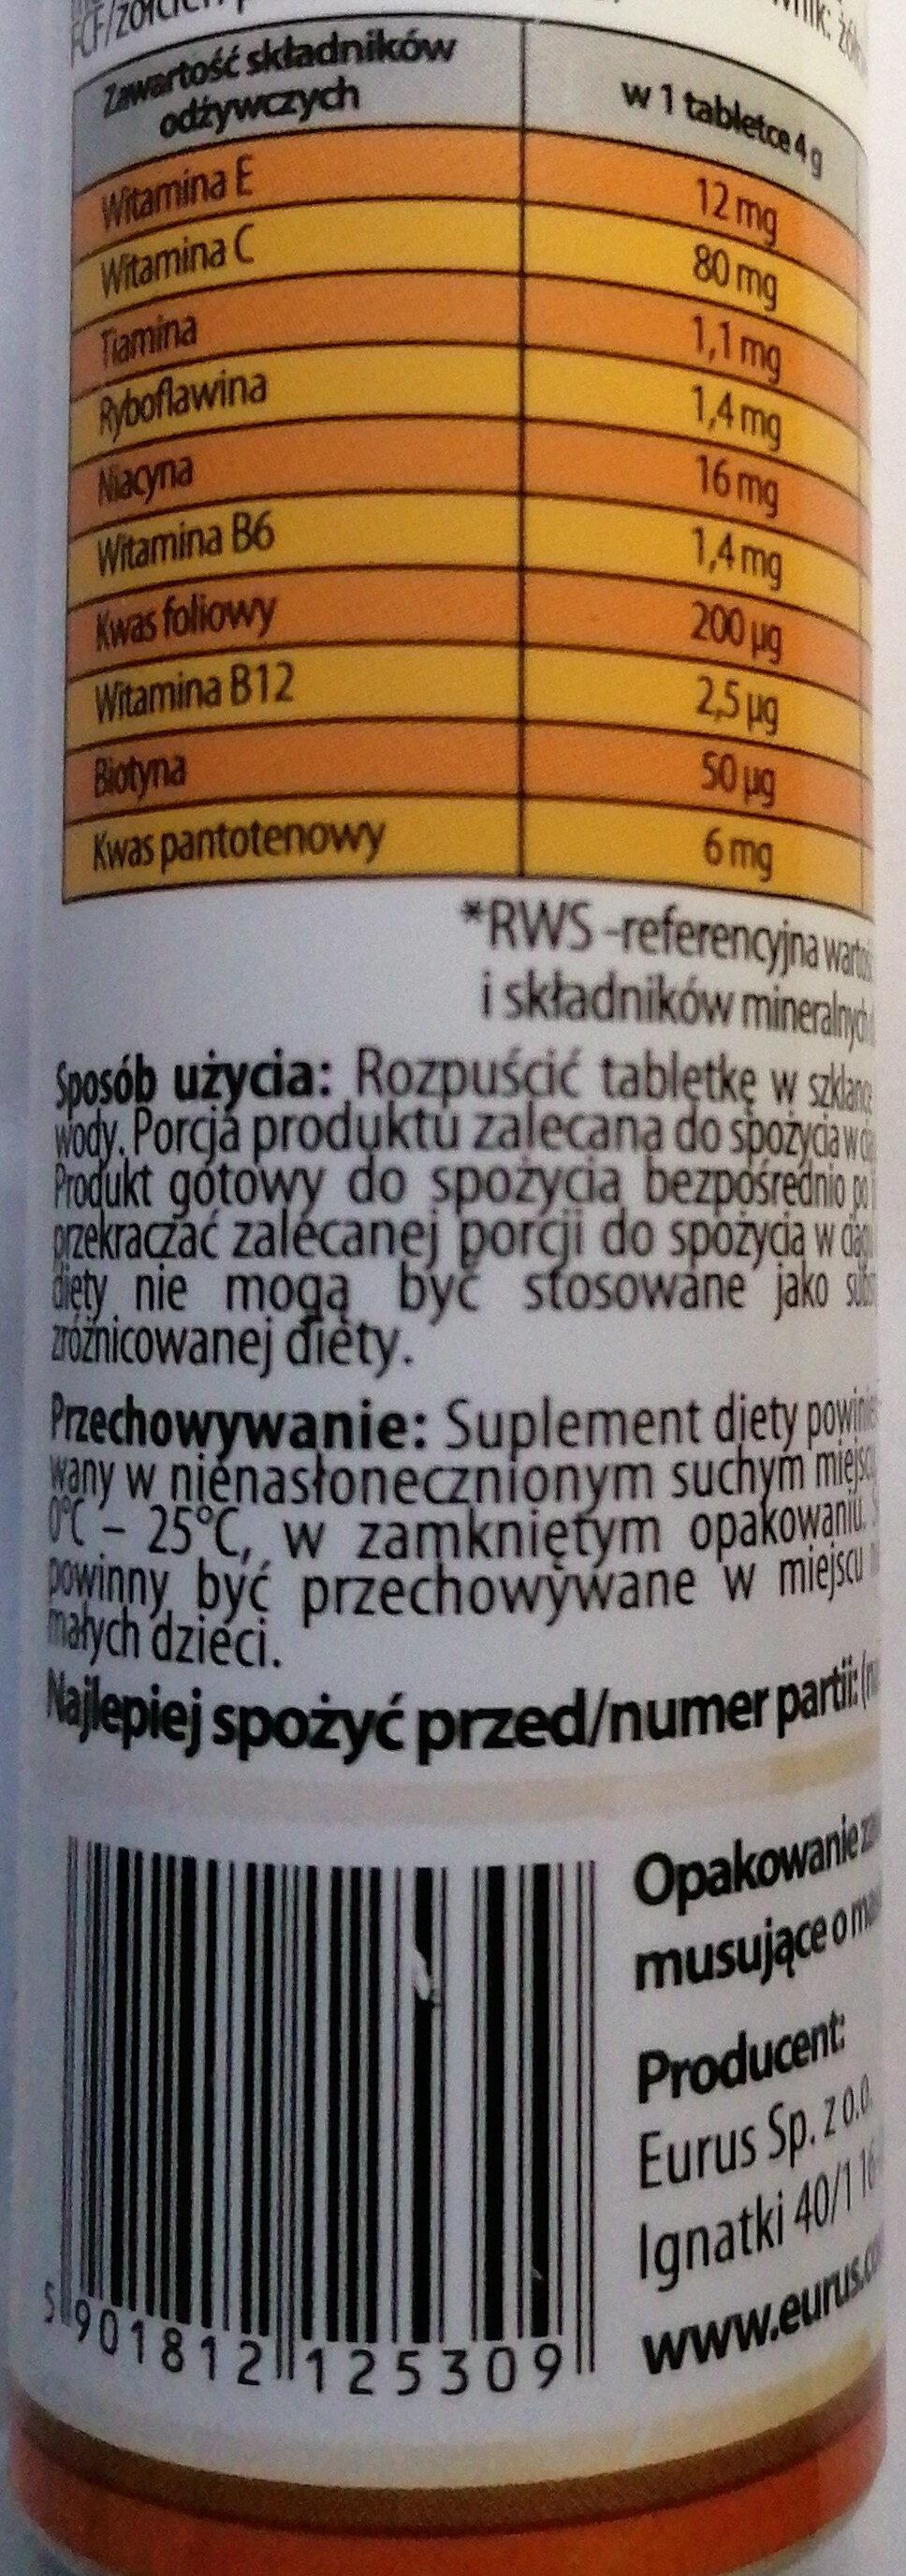 Vitacaps Multivitamina - Informations nutritionnelles